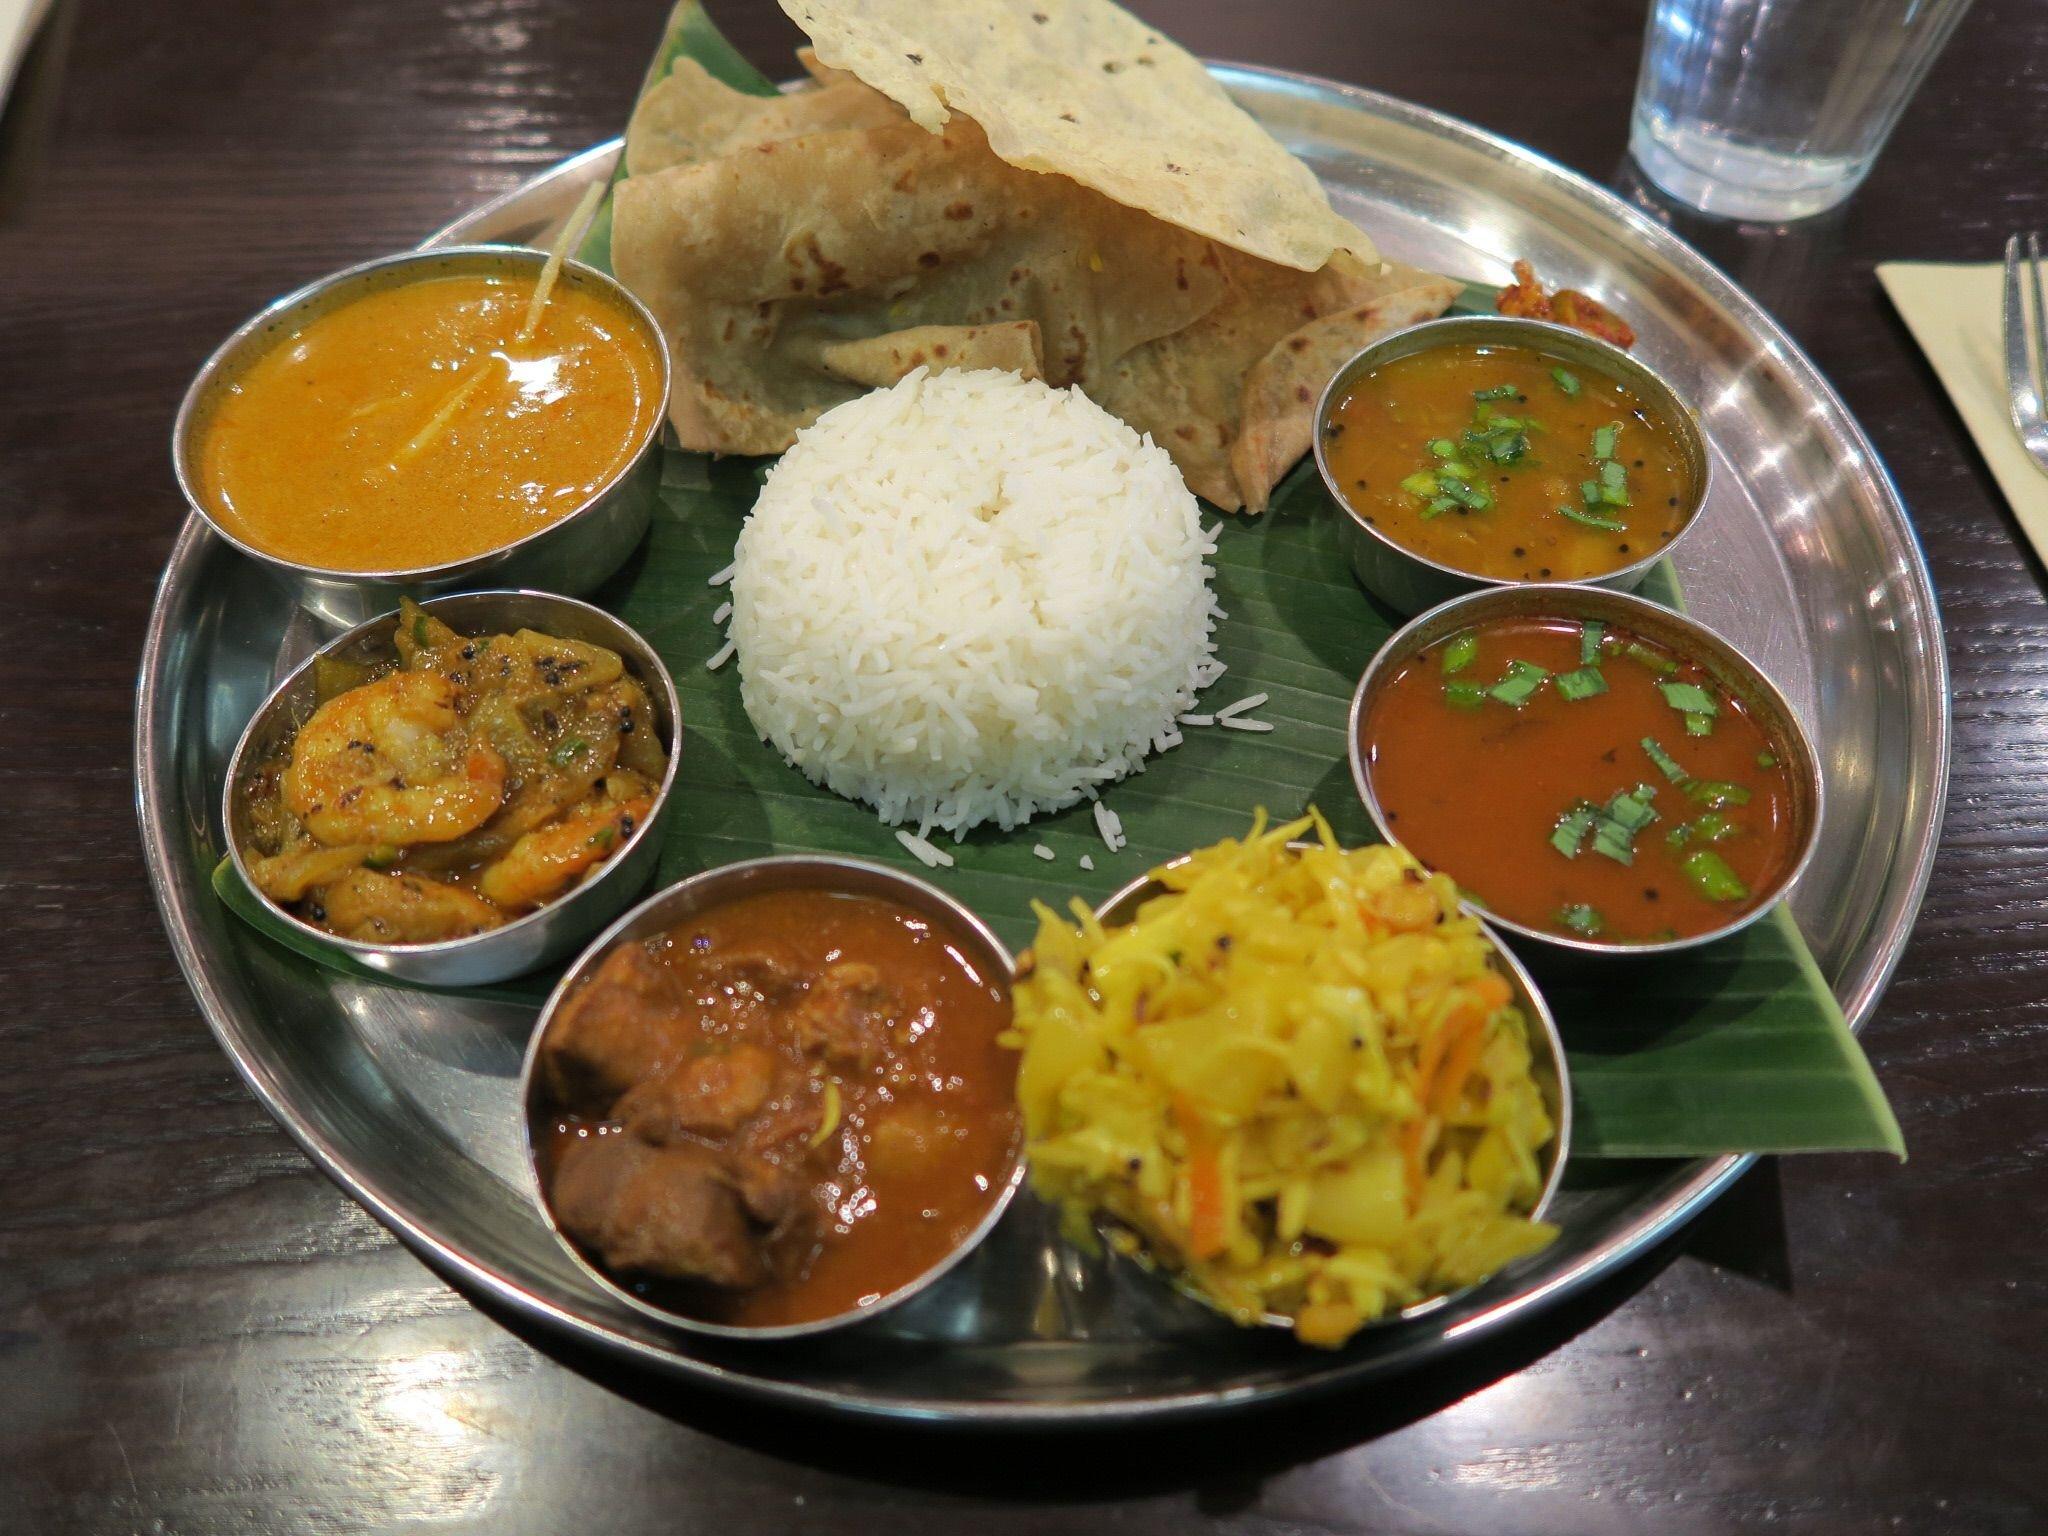 if you use indian curry well keep calories down 37061306 - インドカレーは上手く利用すればカロリーを抑えダイエット食になるらしい